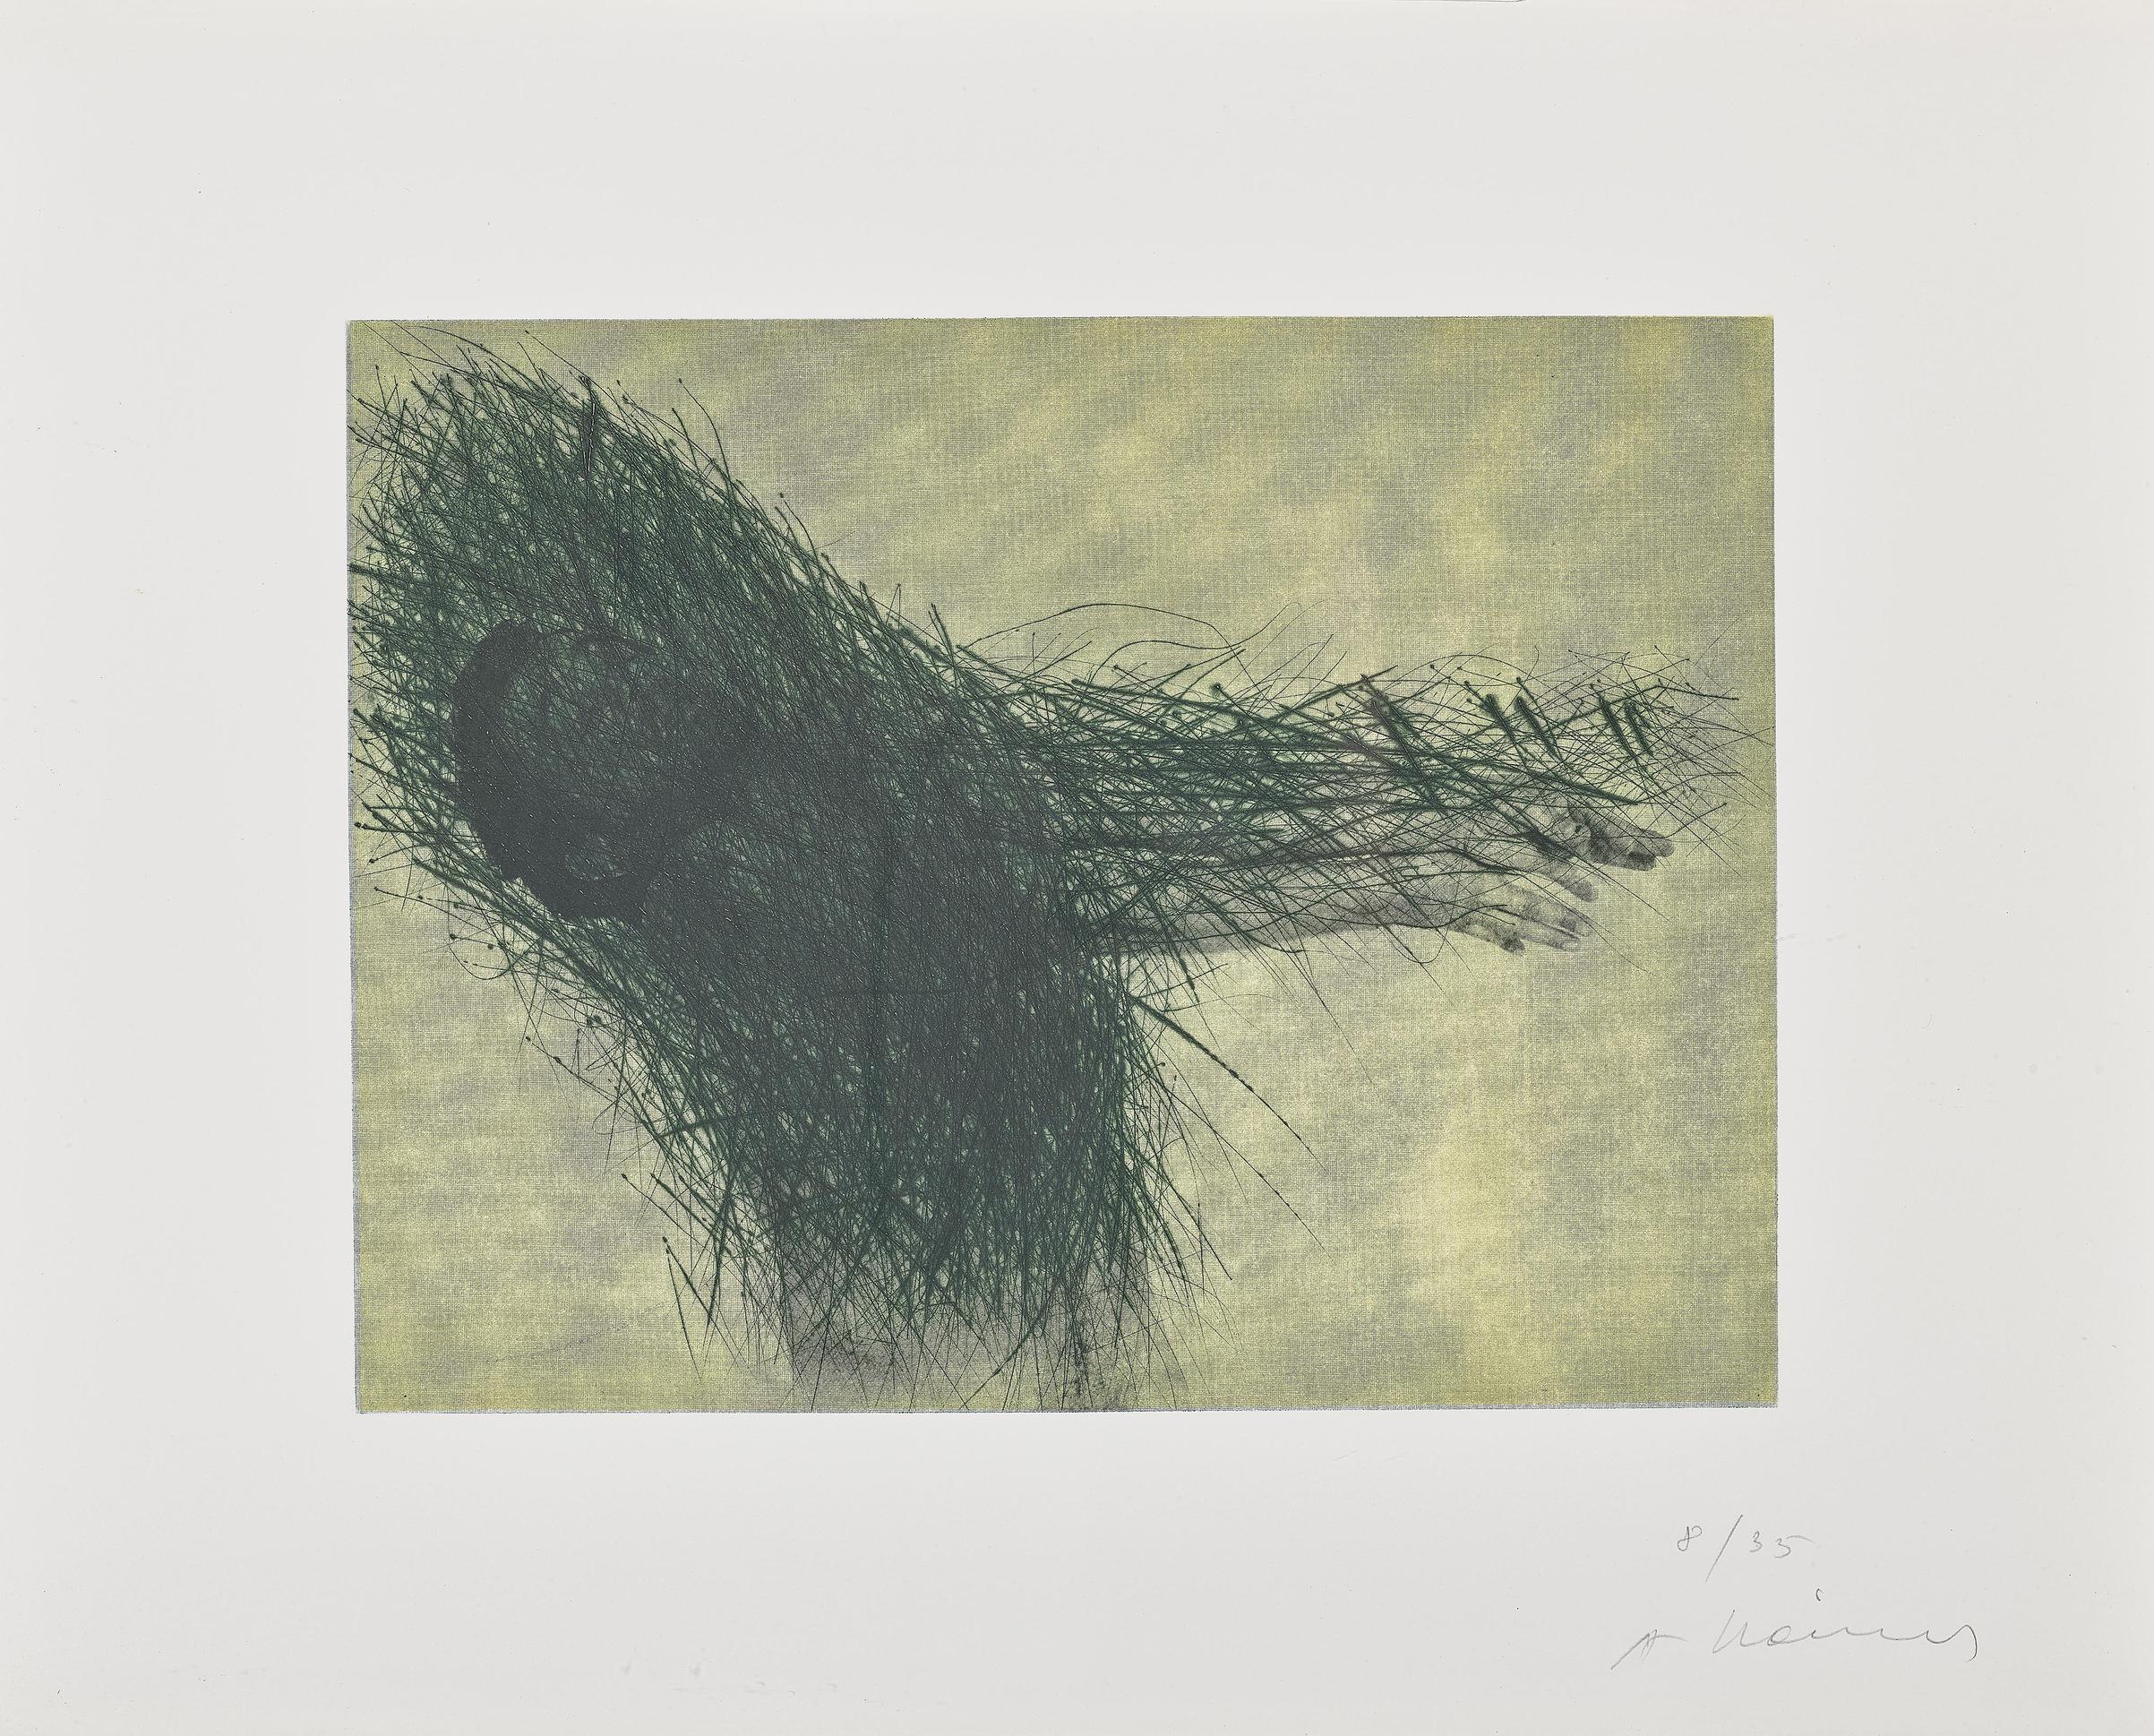 Arnulf Rainer-Selbst Als Blinder (Self-portrait as a blind man)-1991